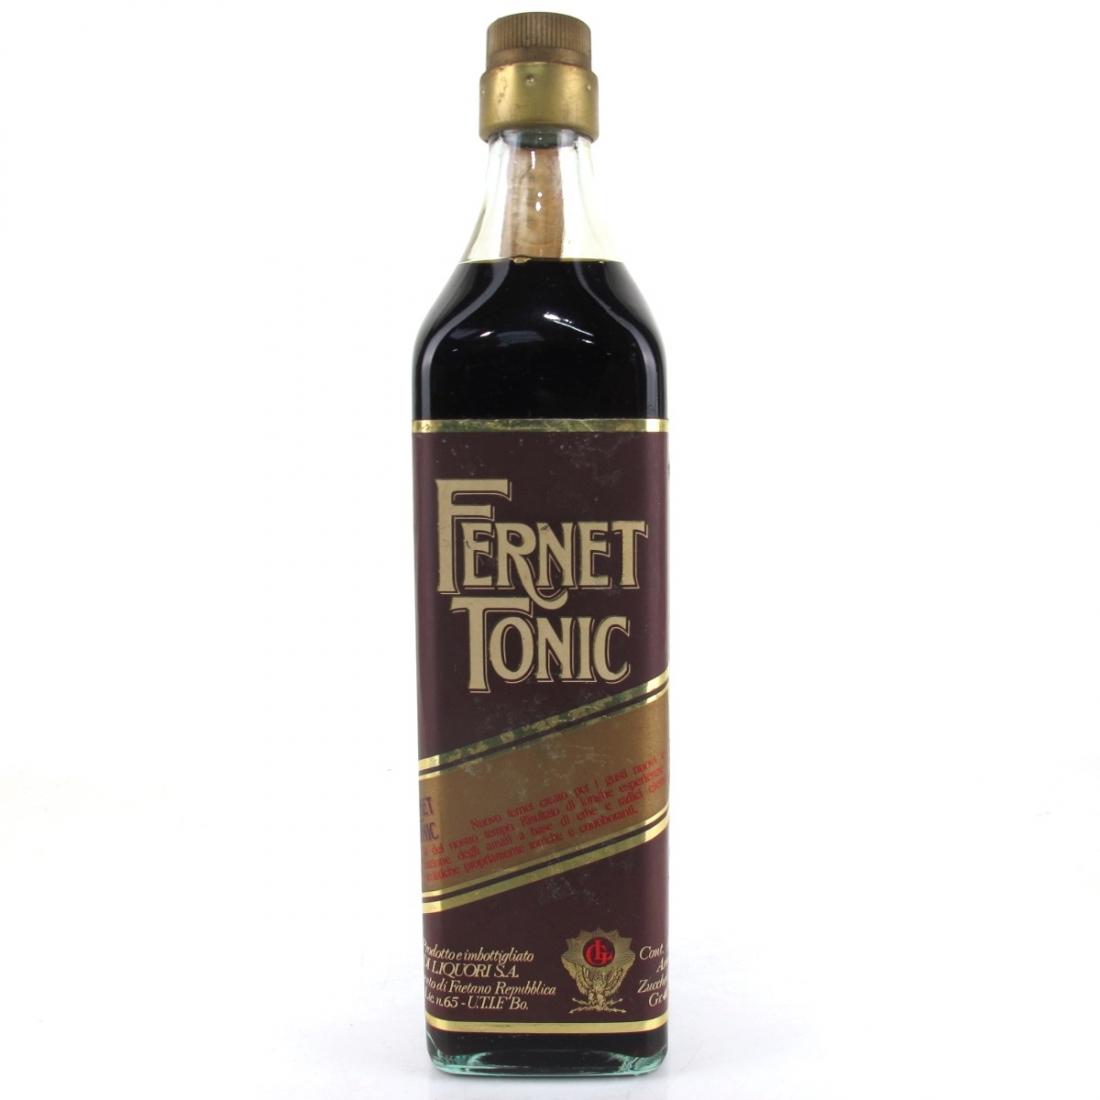 Fernet Tonic Circa 1970s